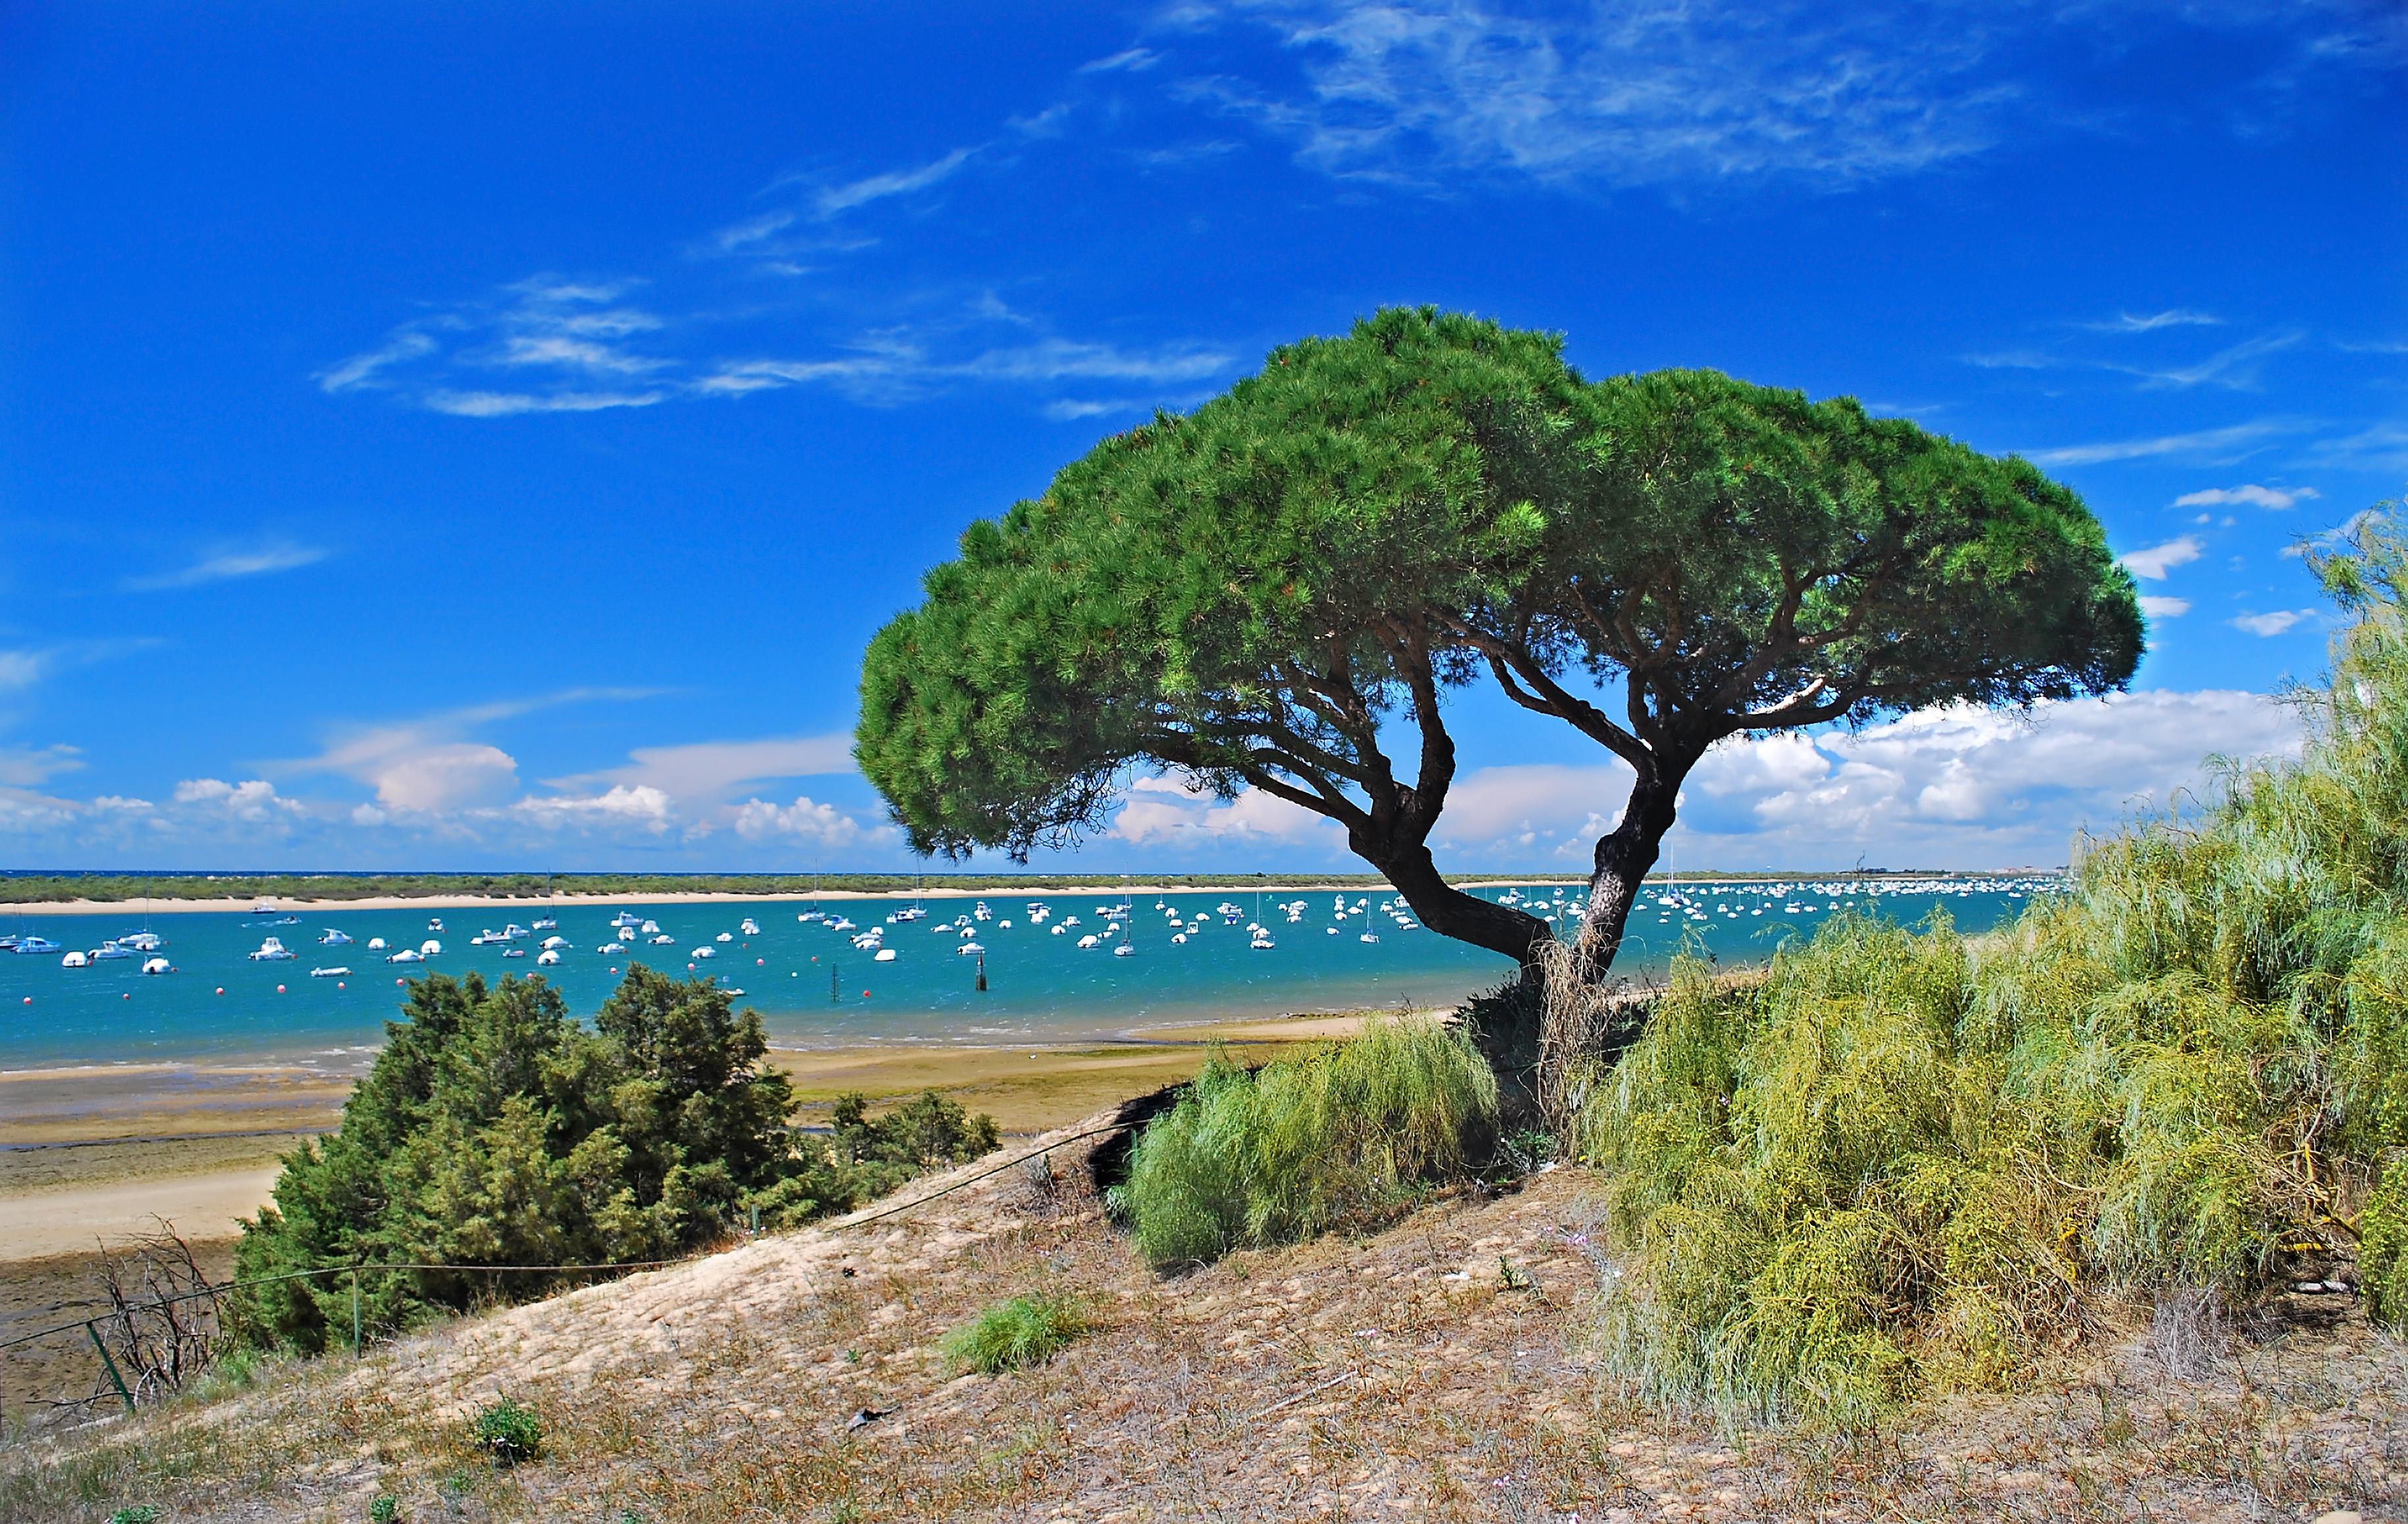 Playa Playa de la Corcollada